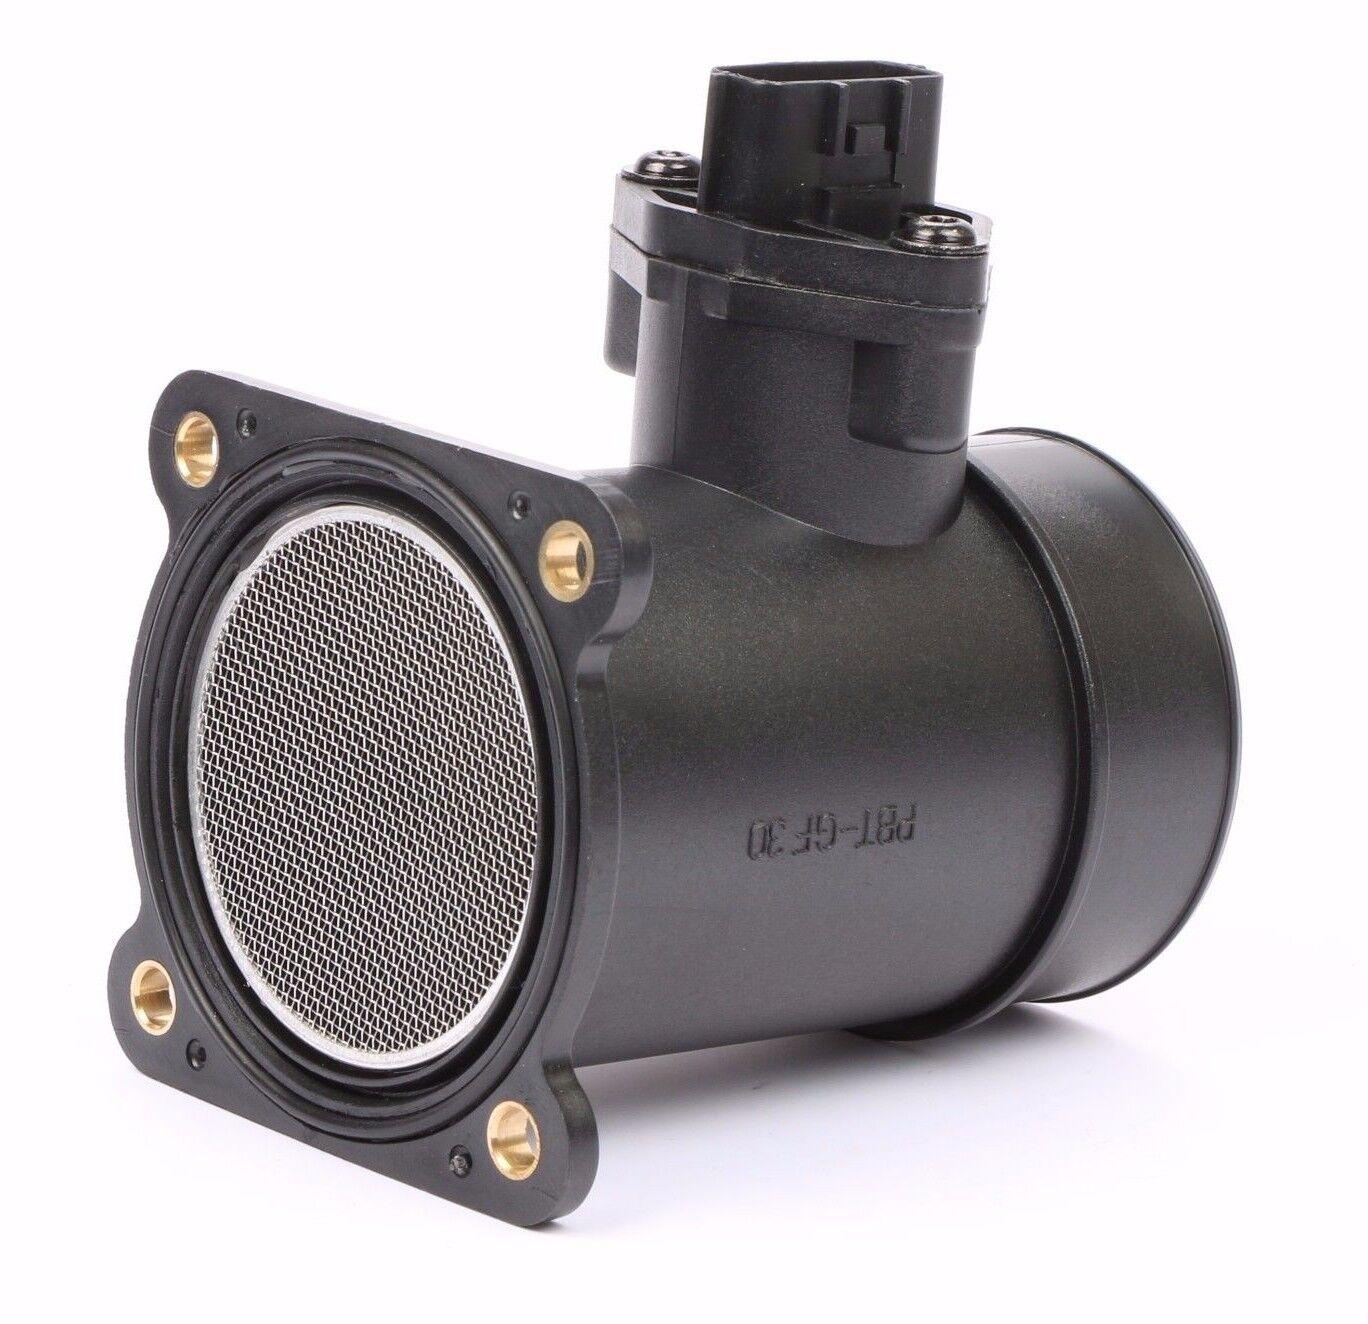 New Bosch Mass Air Flow MAF Sensor for 2000 2001 2002 Nissan Sentra L4 1.8L